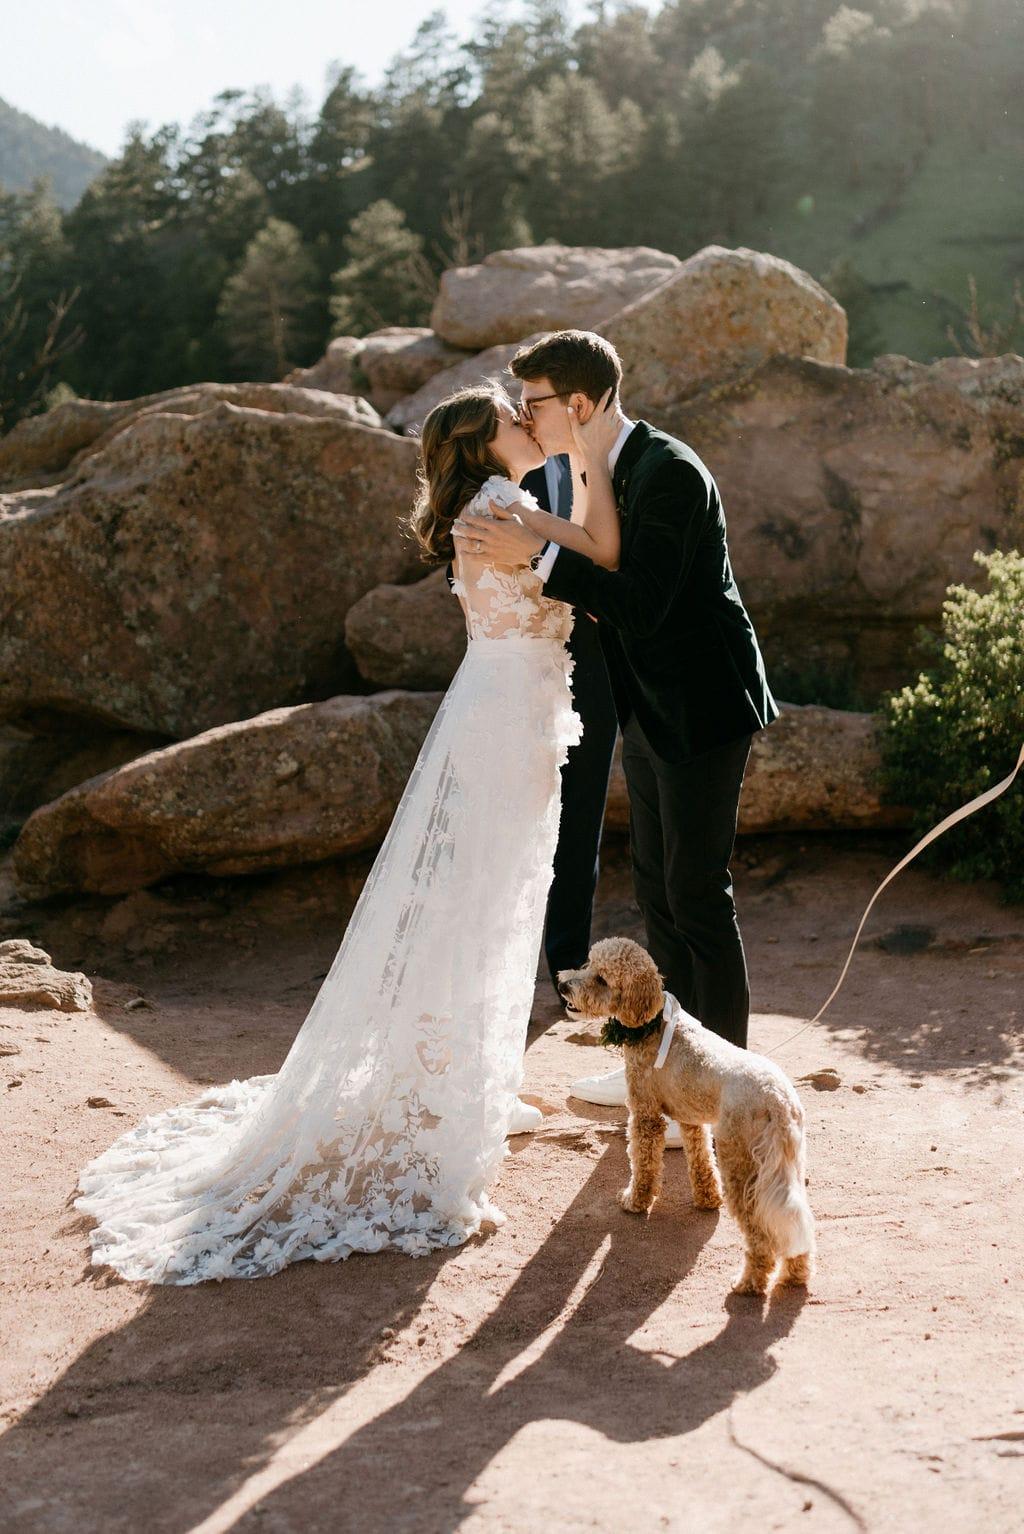 Bride and Groom Kiss at Boulder Colorado Elopement at Settlers Park